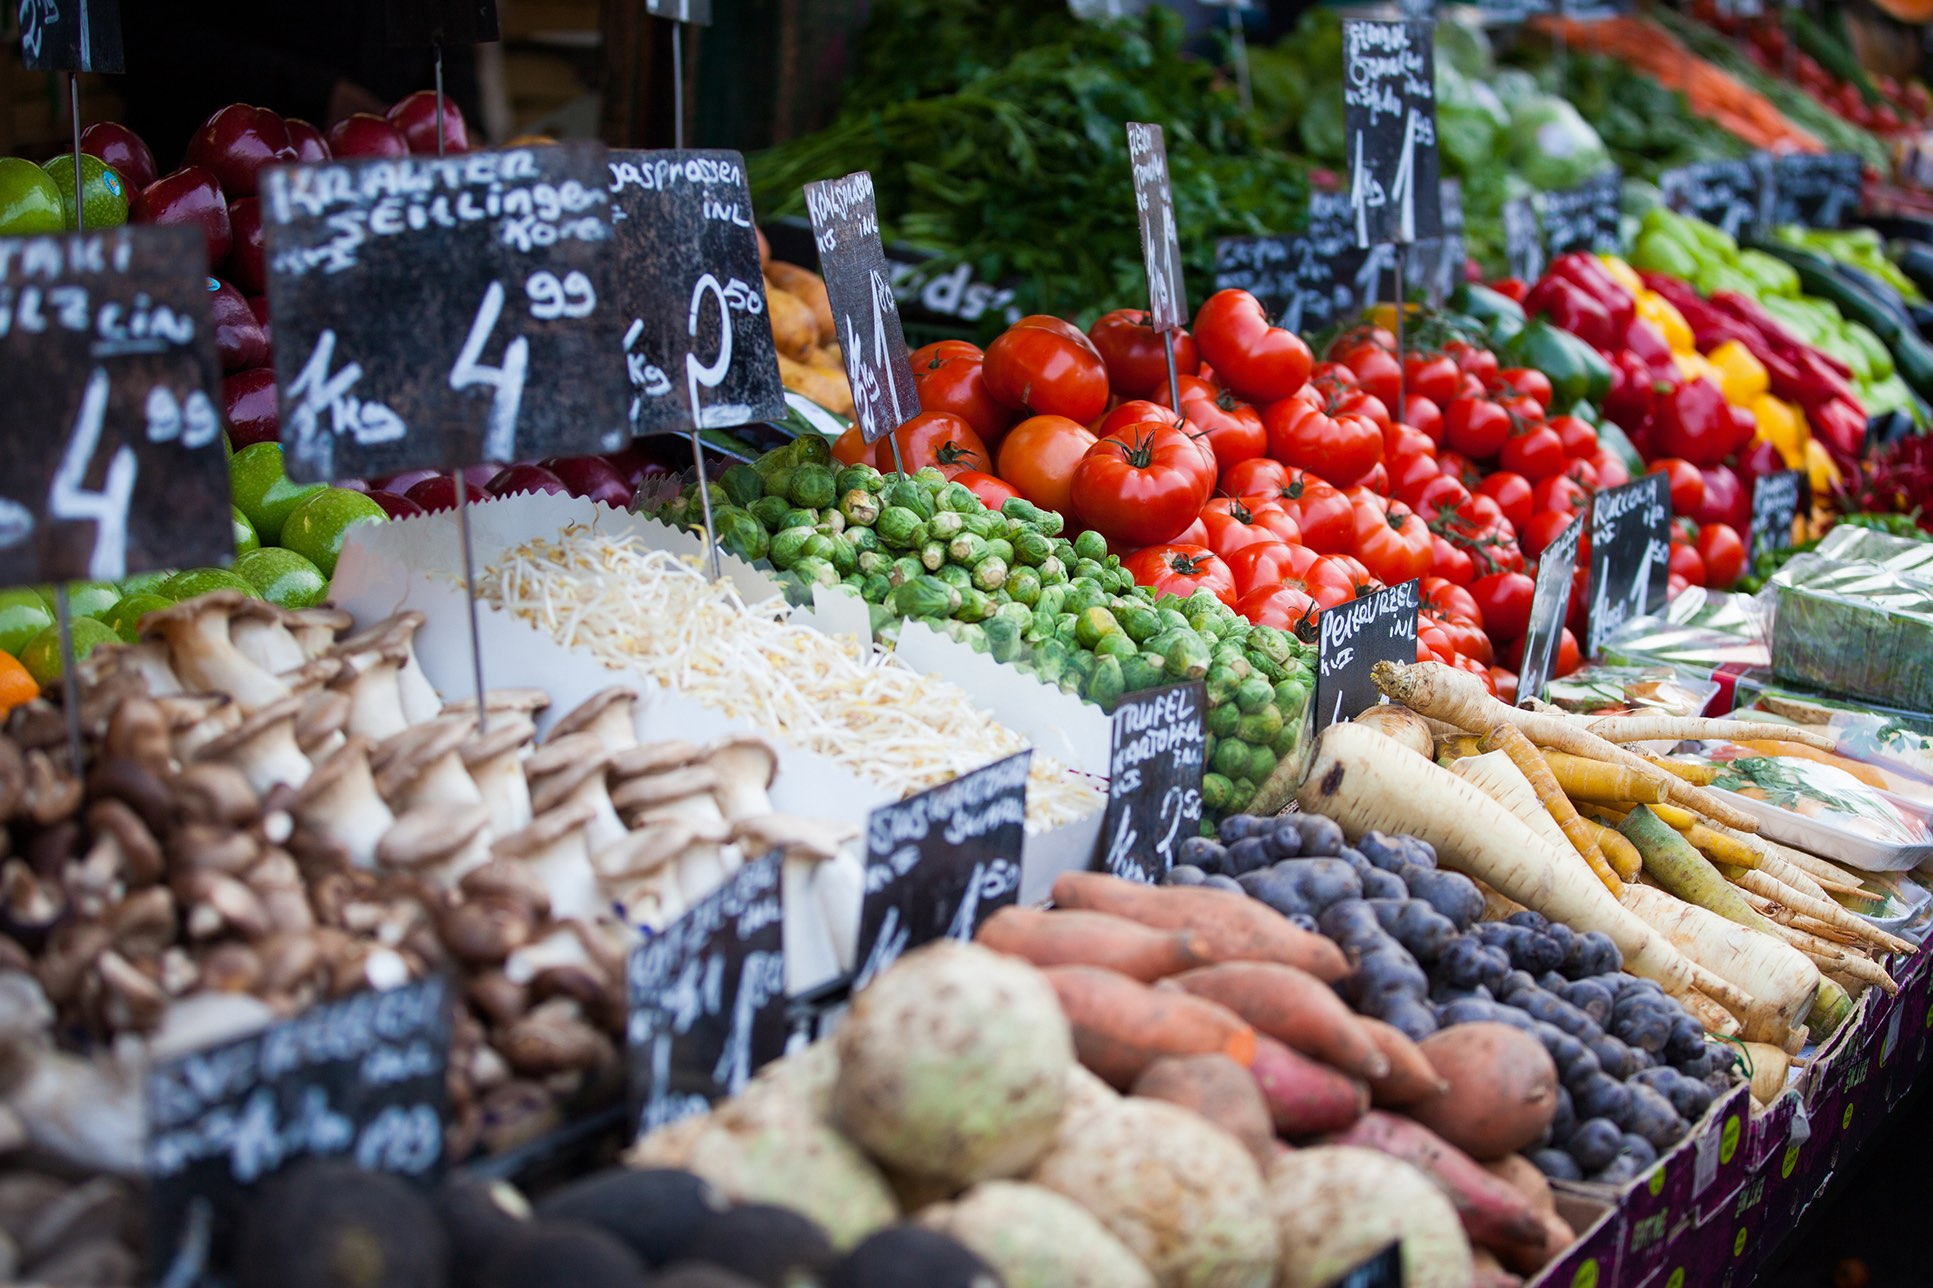 Marktstand mit verschiedenen Gemüsesorten